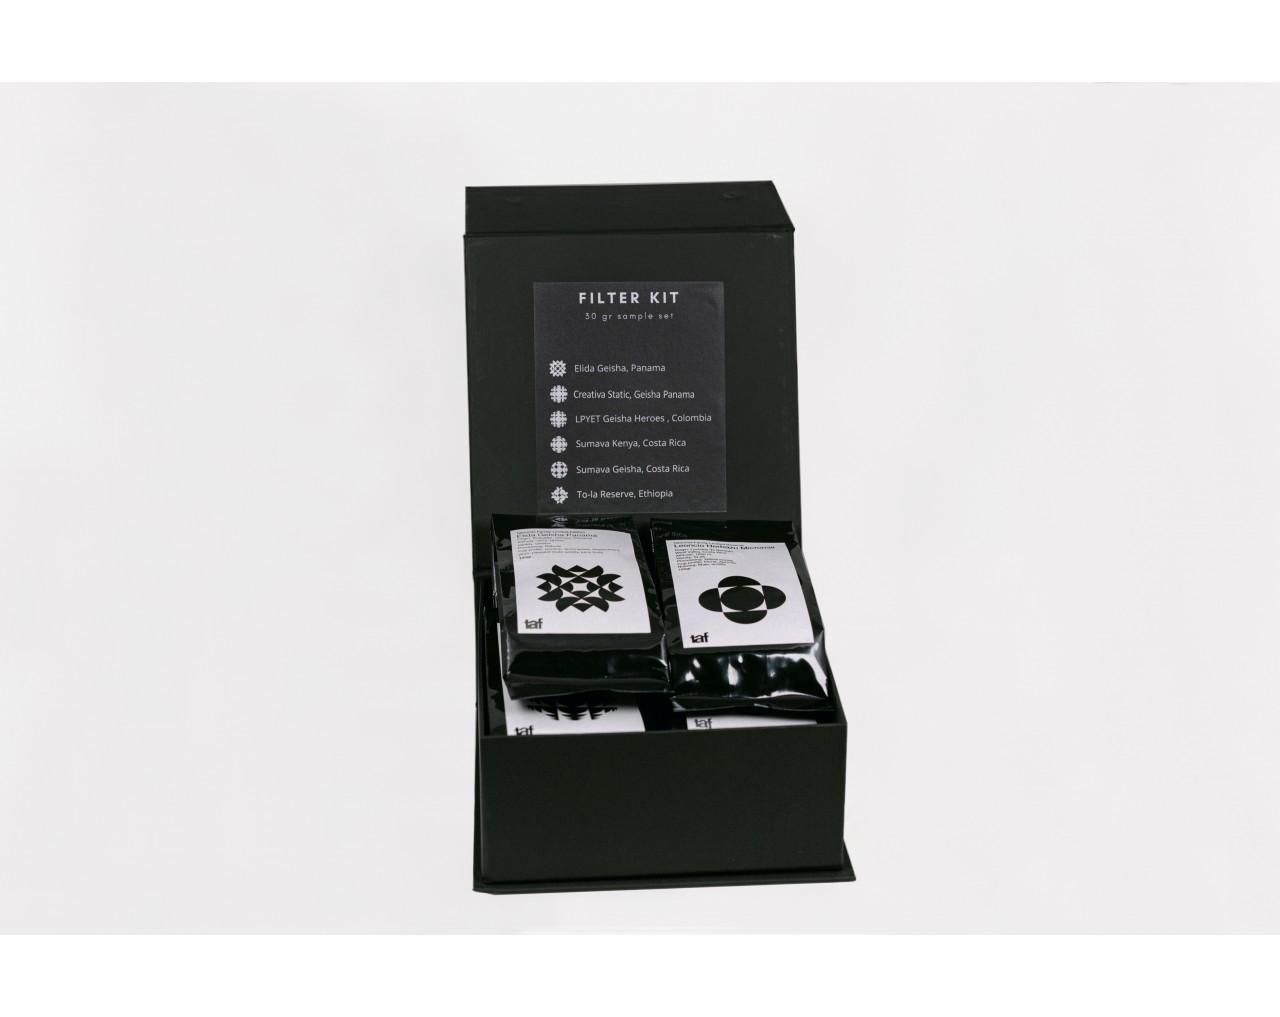 Taloumis Family Limited Reserve - Filter Kit